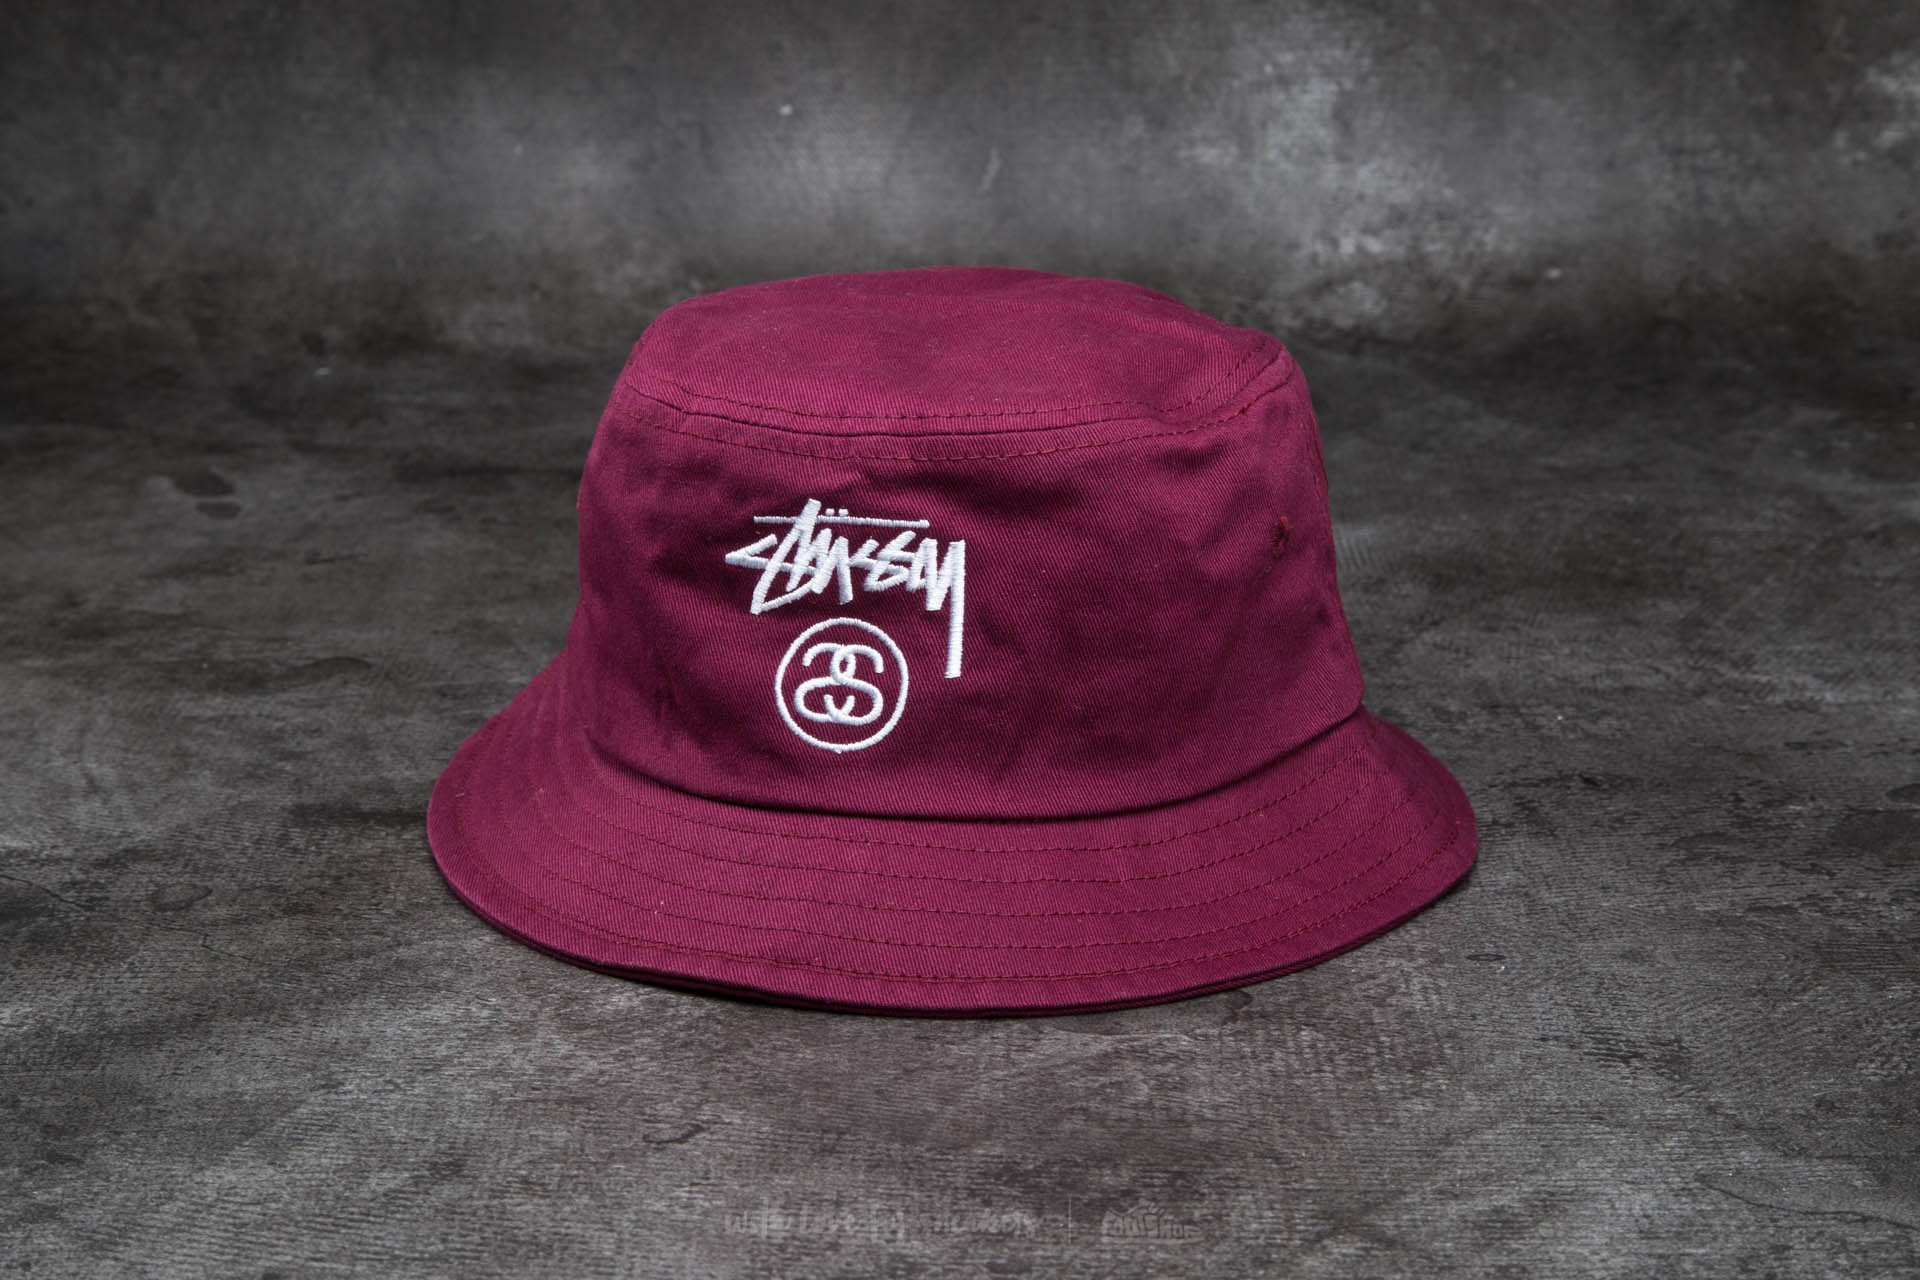 c61364b5cf2 Stüssy Stock Lock Sp15 Bucket Hat Burgundy